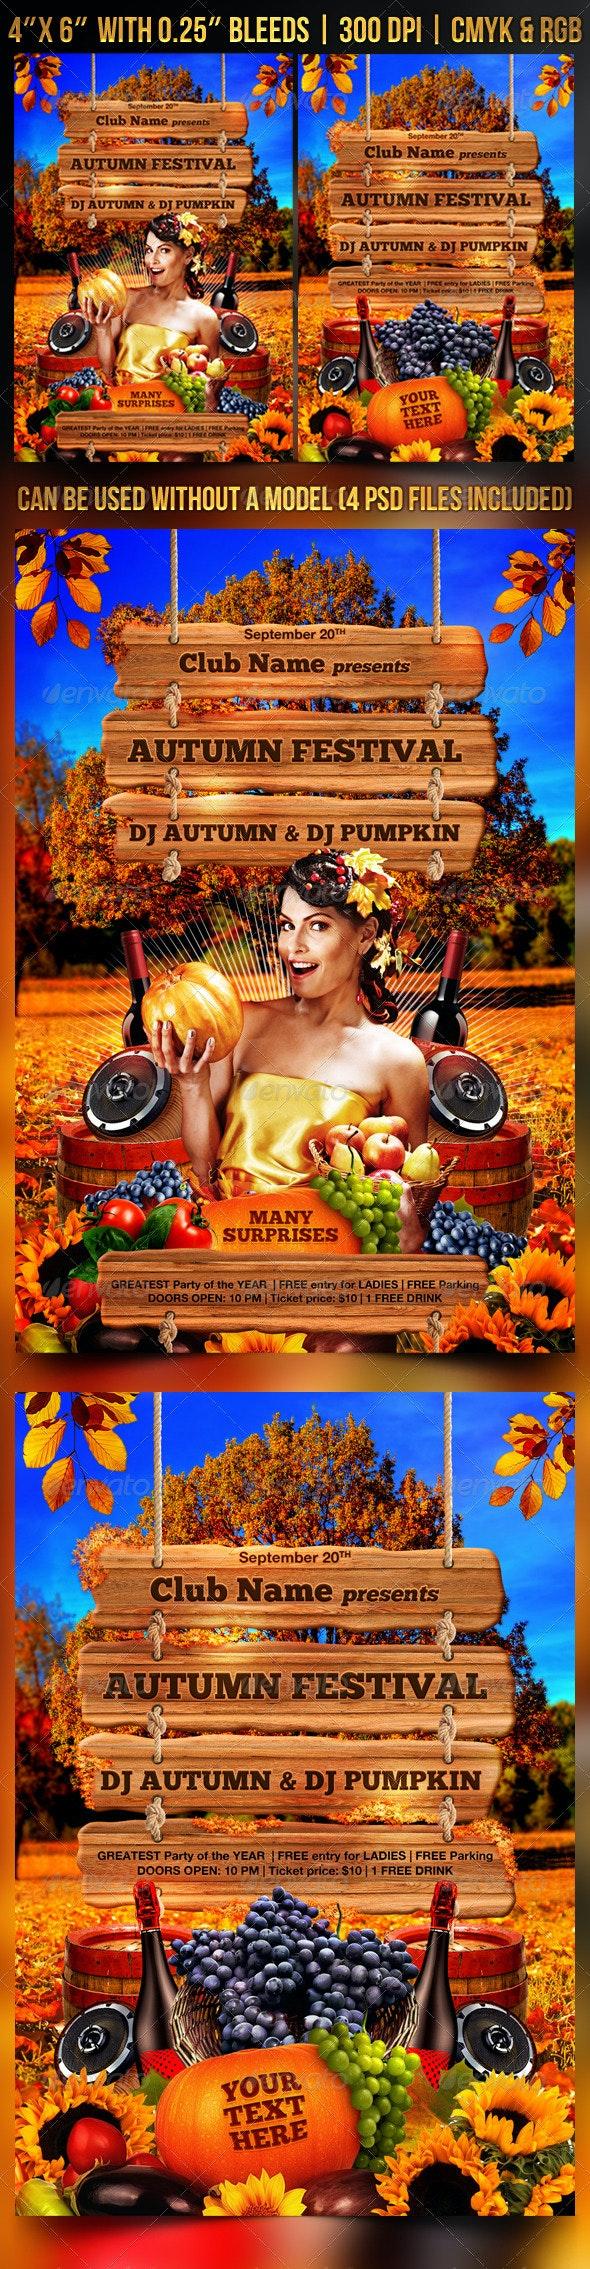 Autumn Festival Flyer Template - Clubs & Parties Events